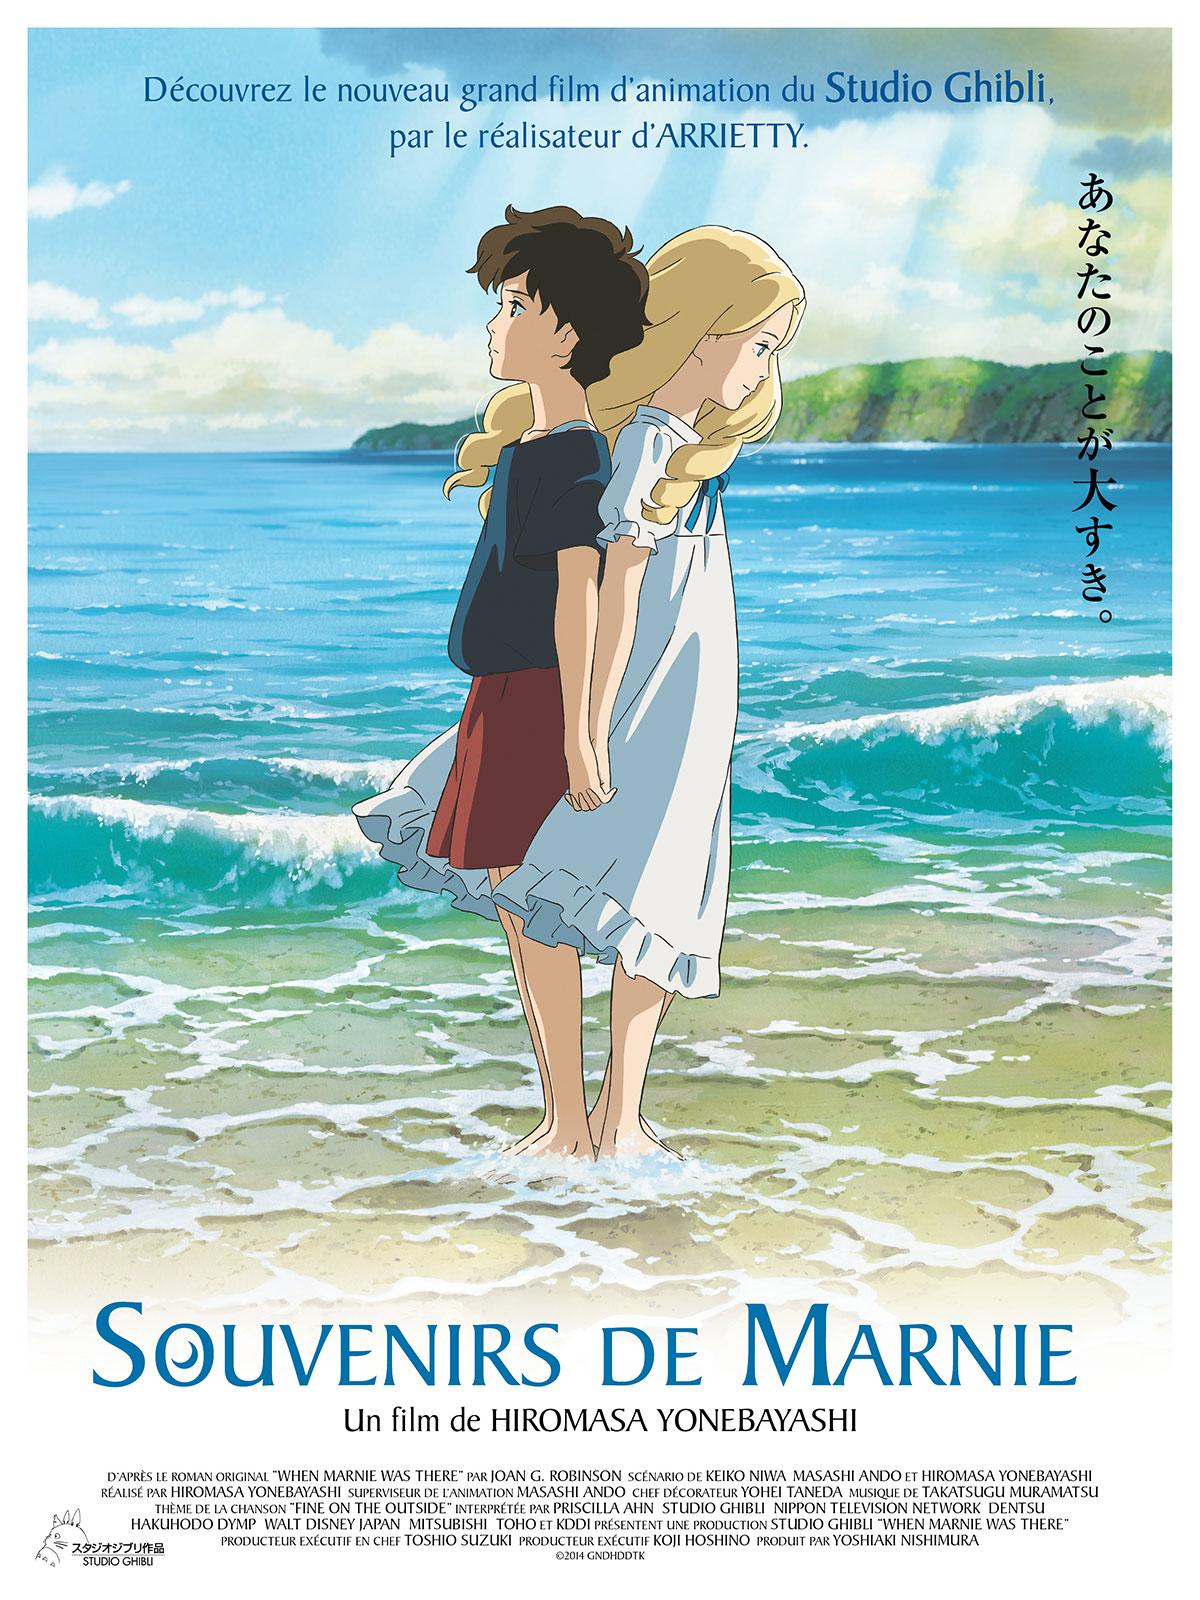 [FILM] Souvenirs de Marnie (Omoide no Marnie) 132203